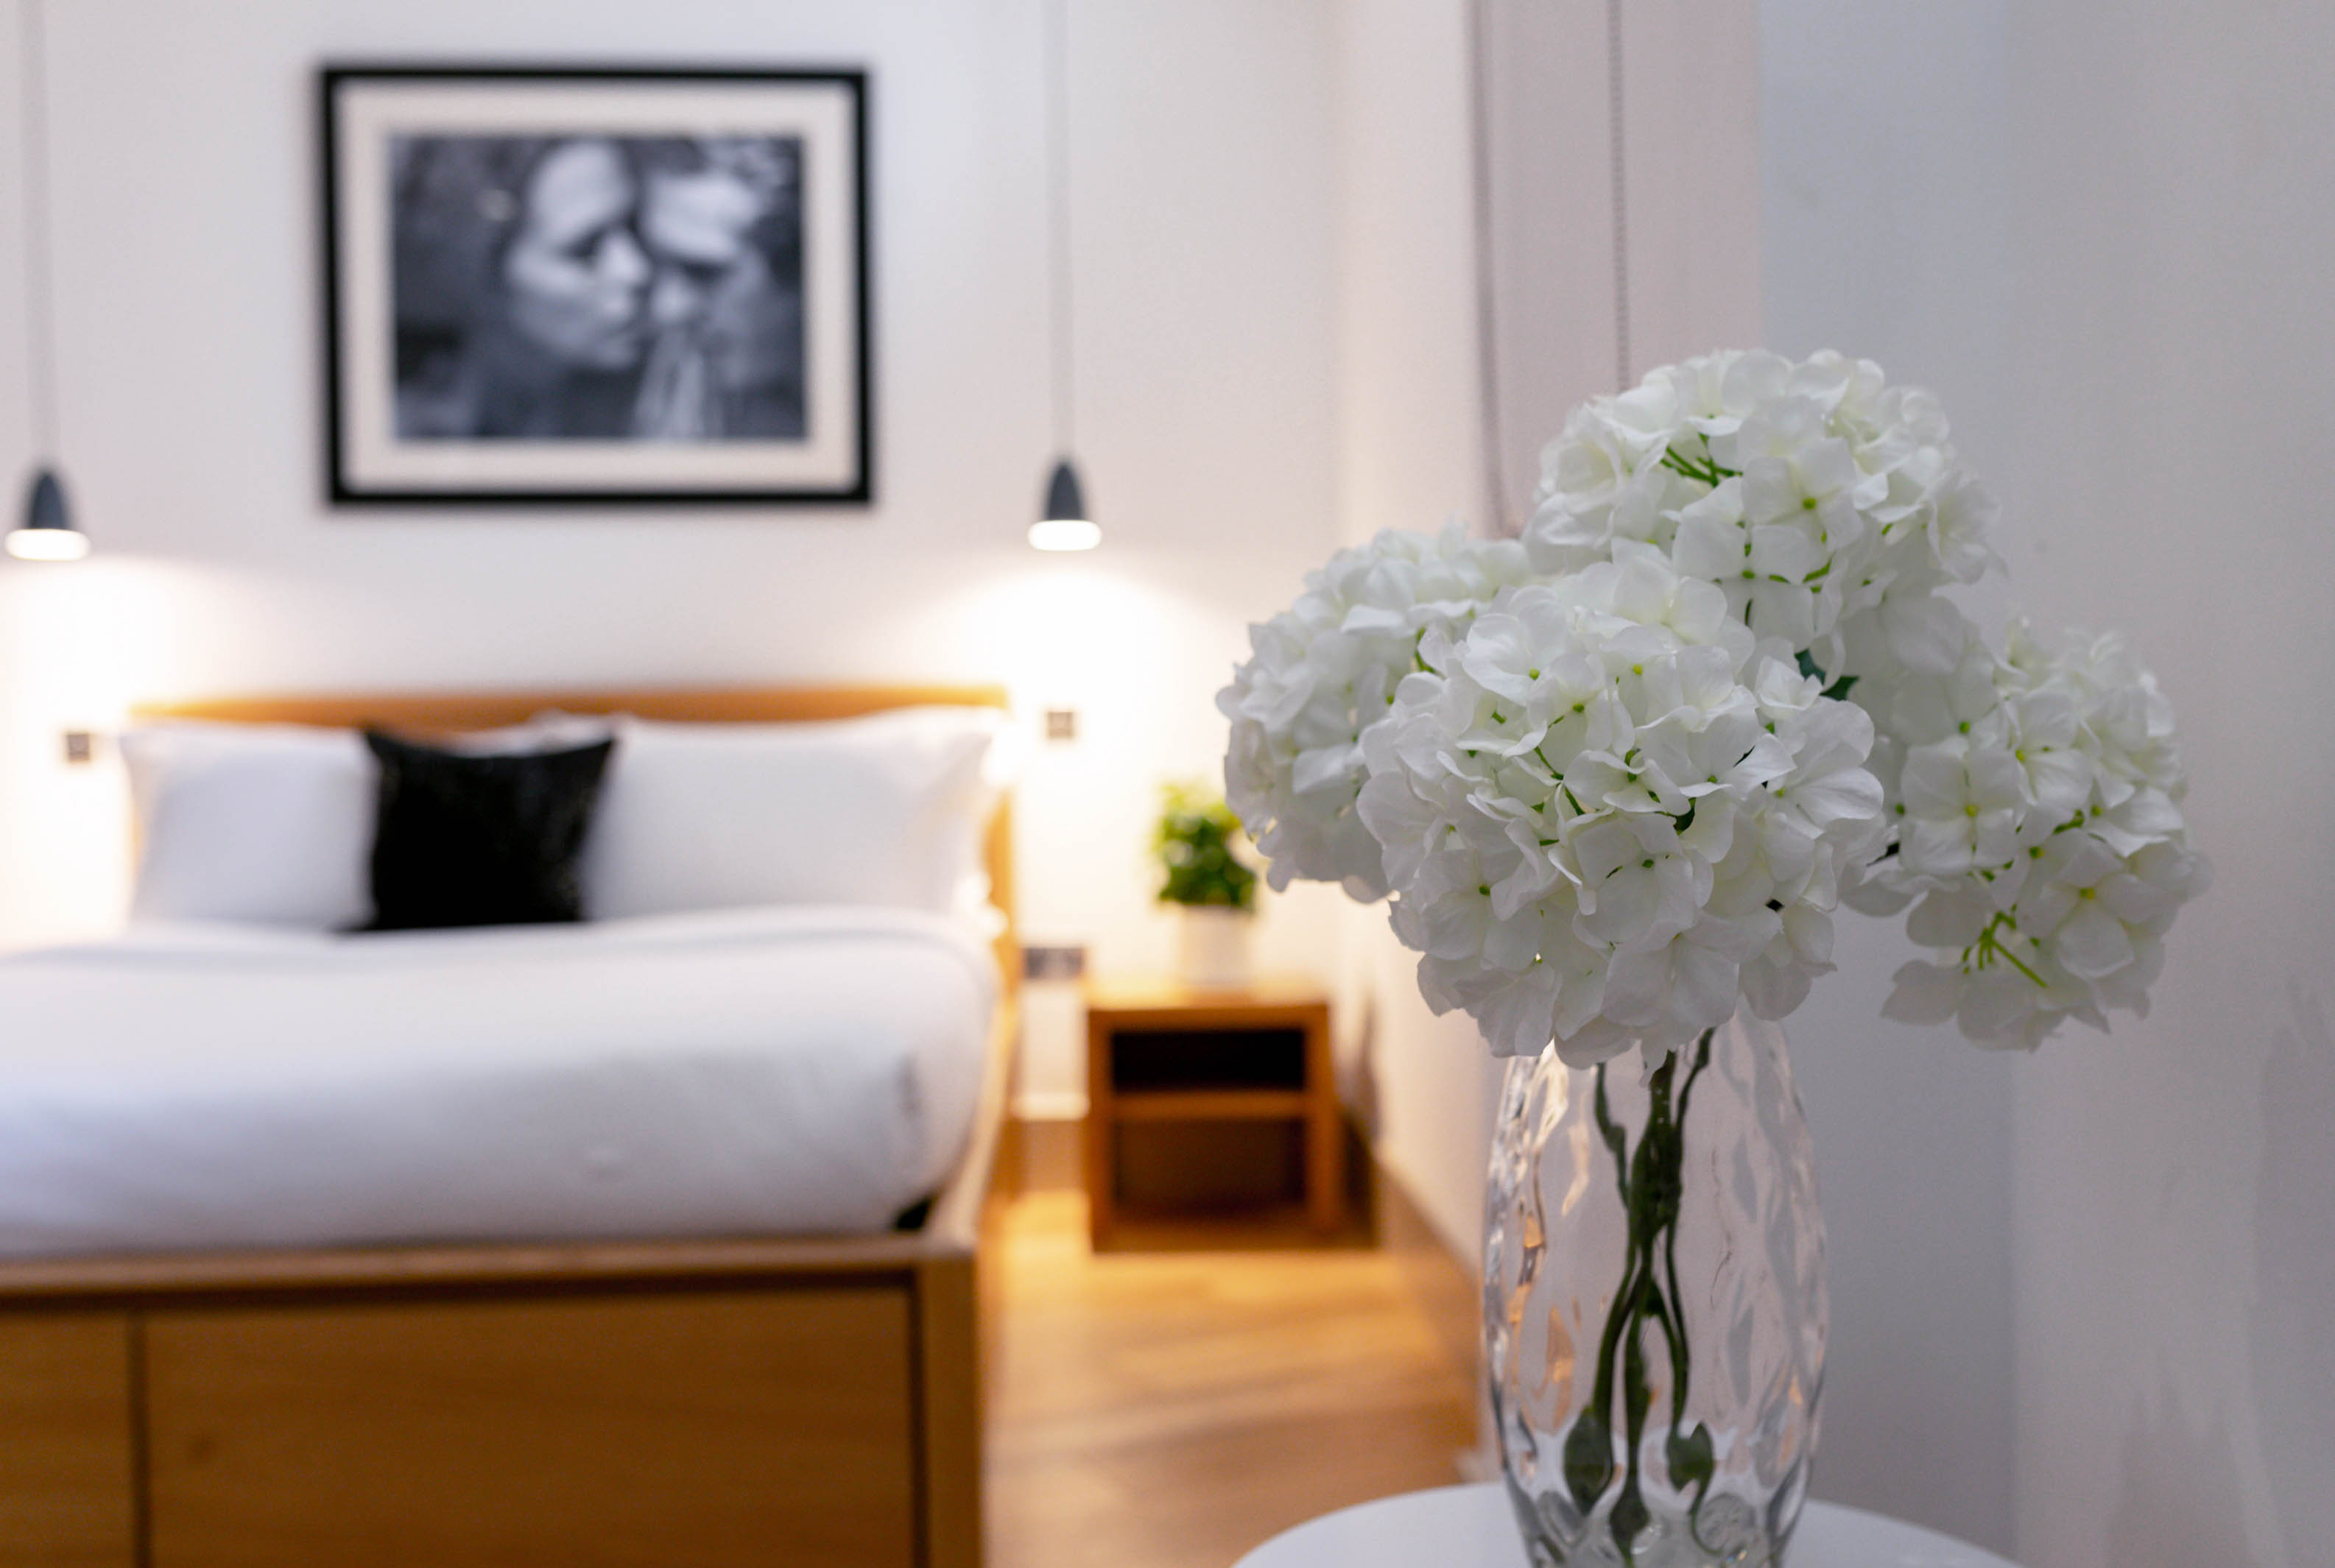 Lovelydays luxury service apartment rental - London - Fitzrovia - Wells Mews B - Lovelysuite - 2 bedrooms - 2 bathrooms - Double bed - ea04aef487e3 - Lovelydays